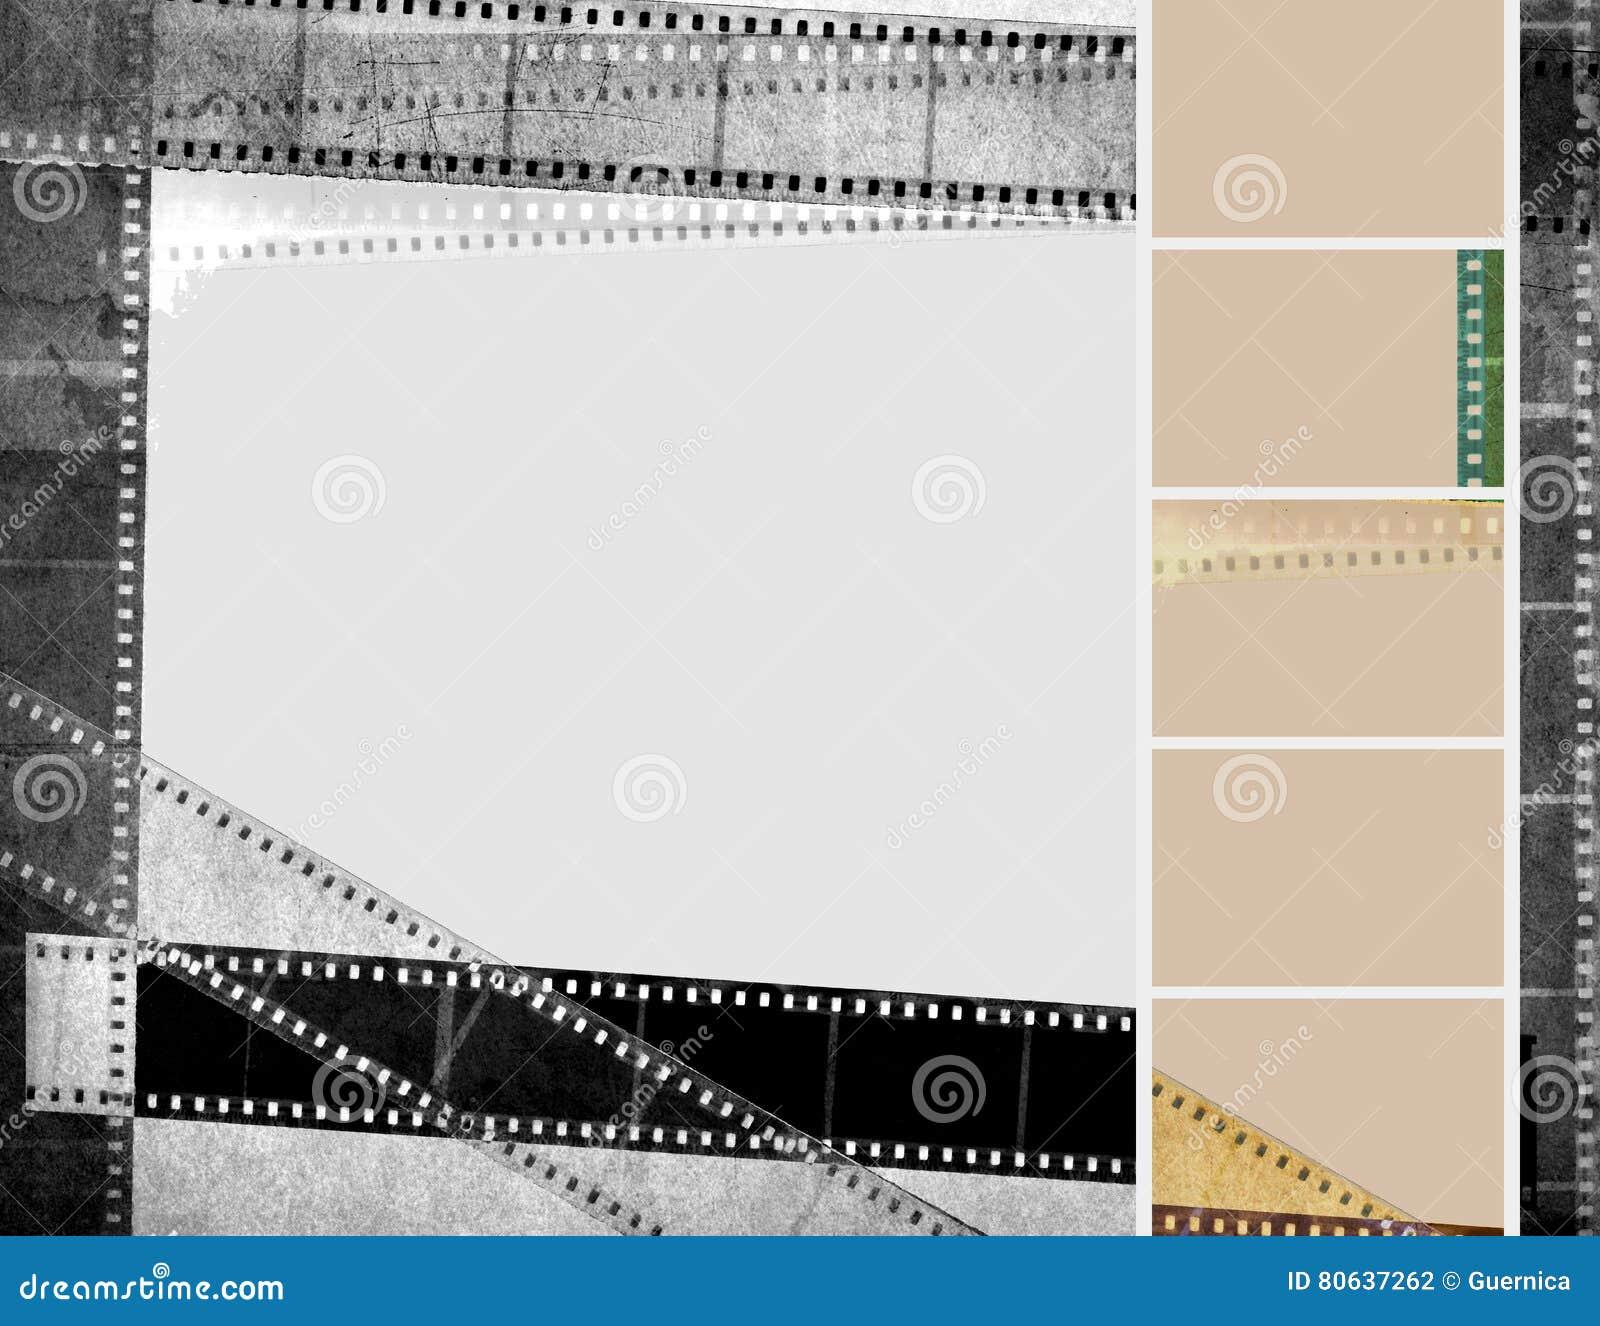 Grunge Film Strip Black White Vintage Background Stock Photo - Image ...